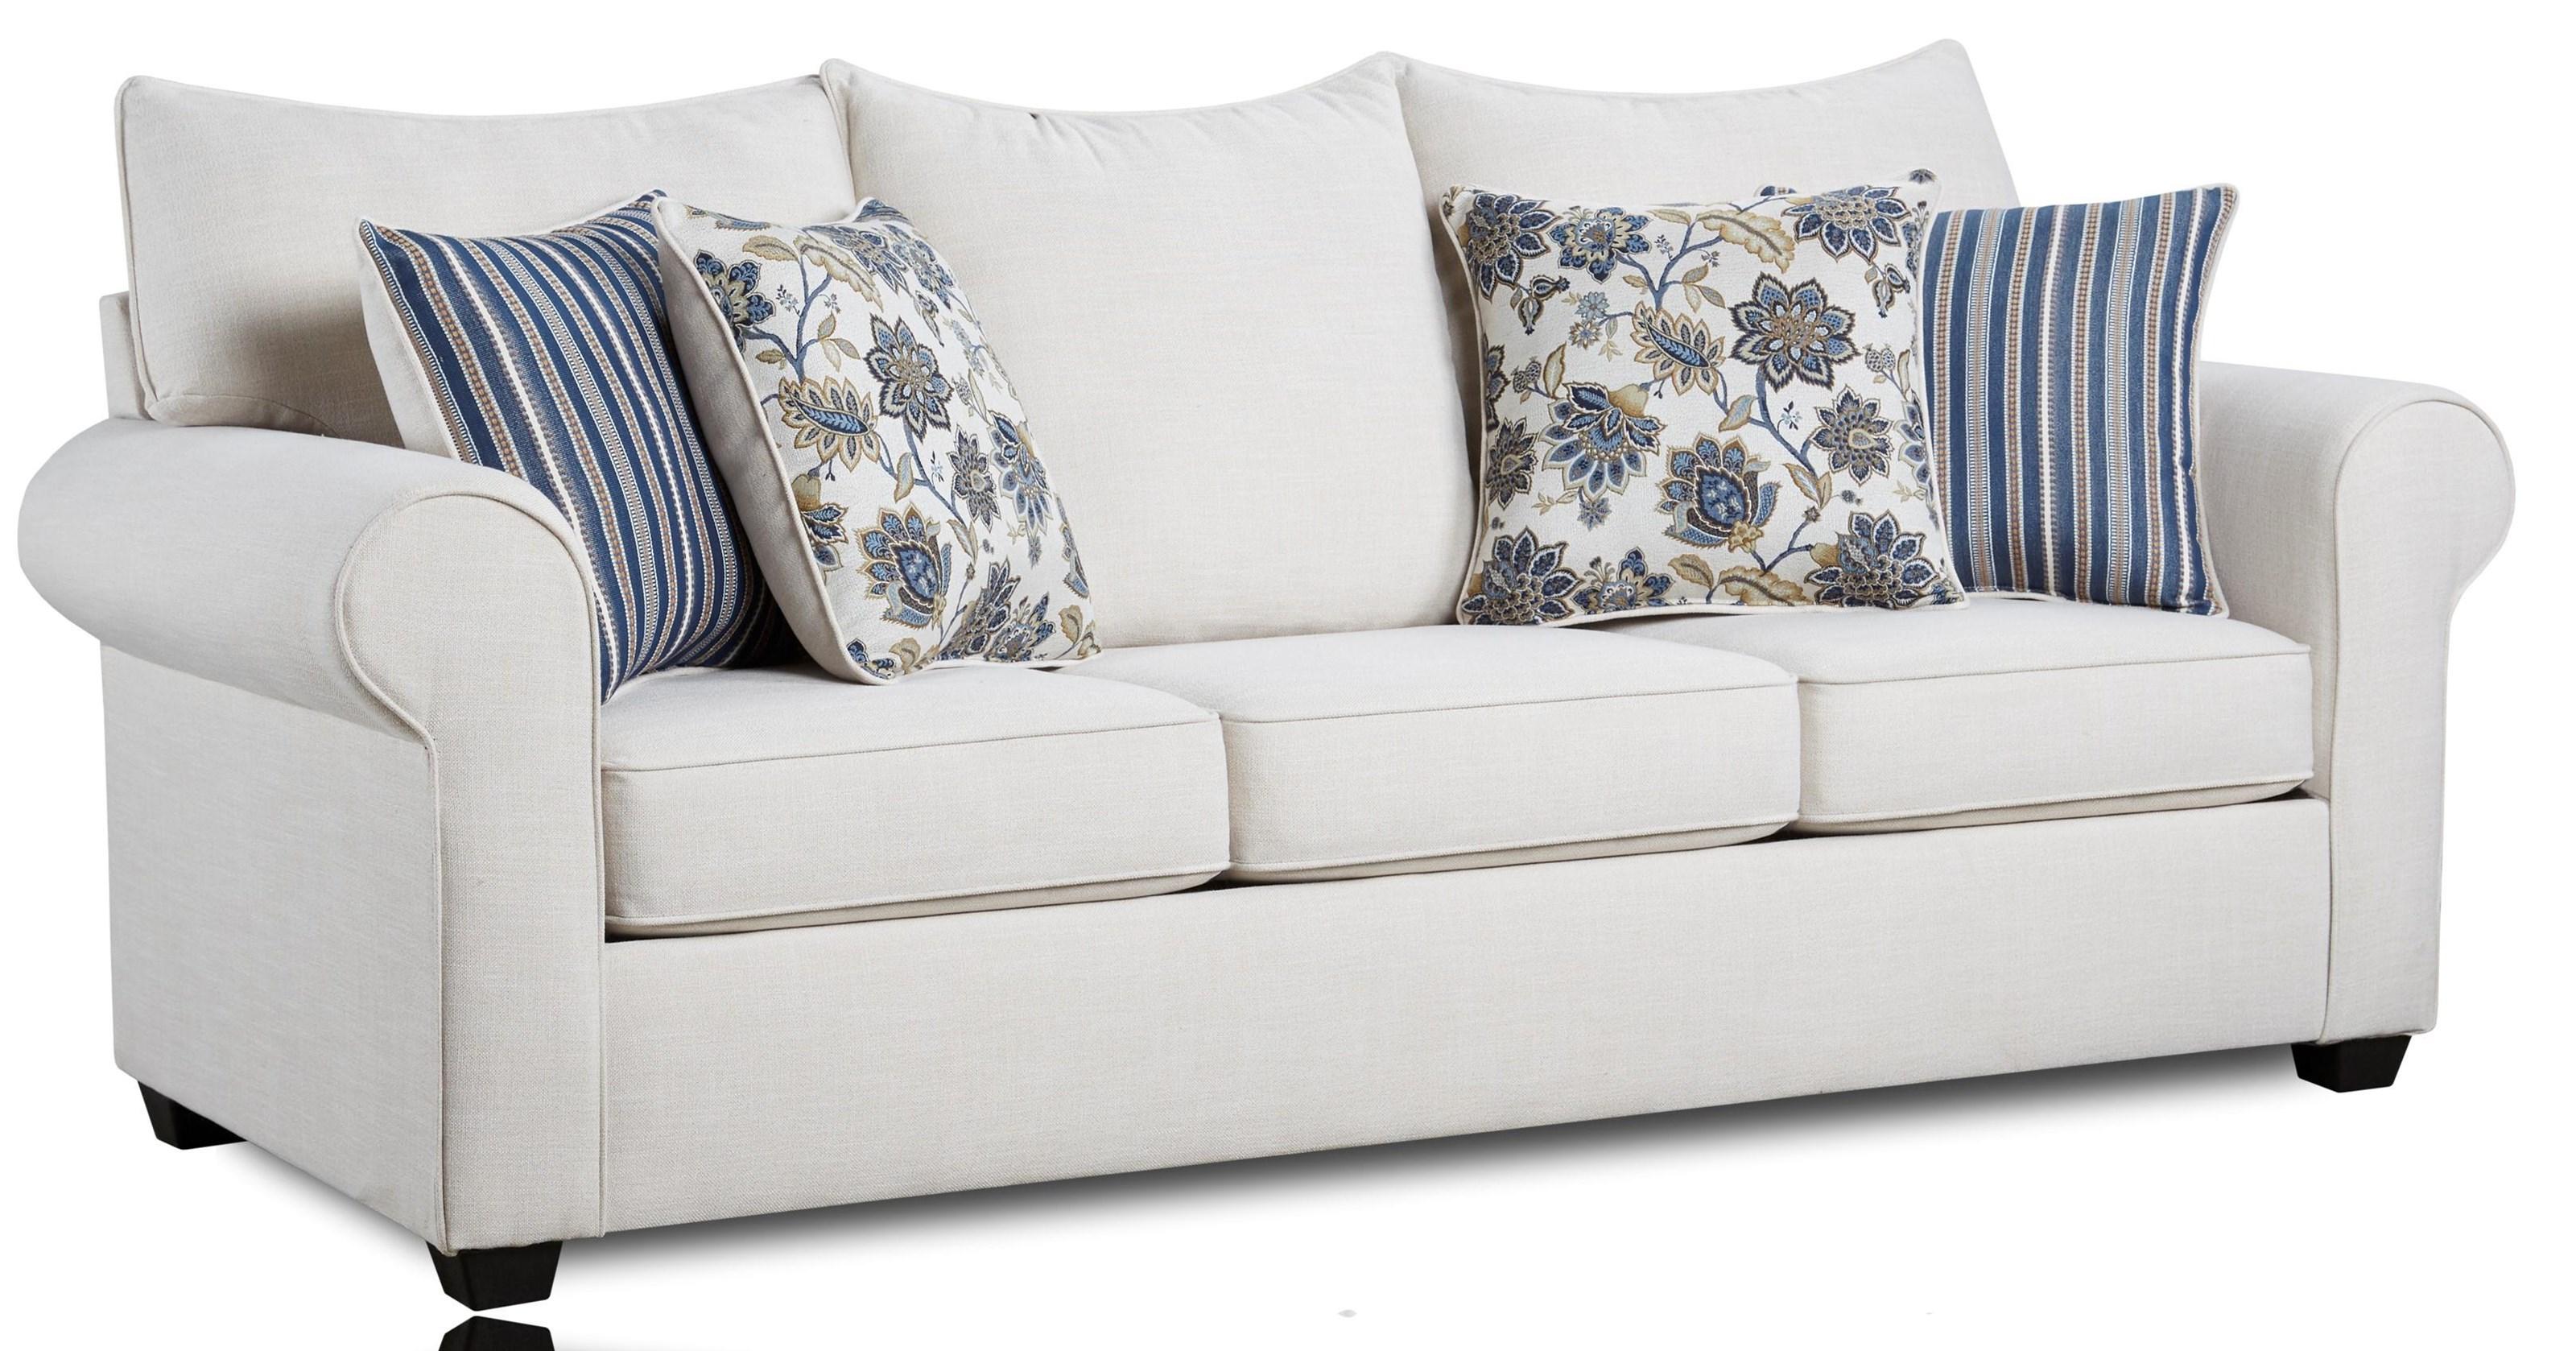 4000 Collection Cream Sofa by Washington Brothers Furniture at Furniture Fair - North Carolina